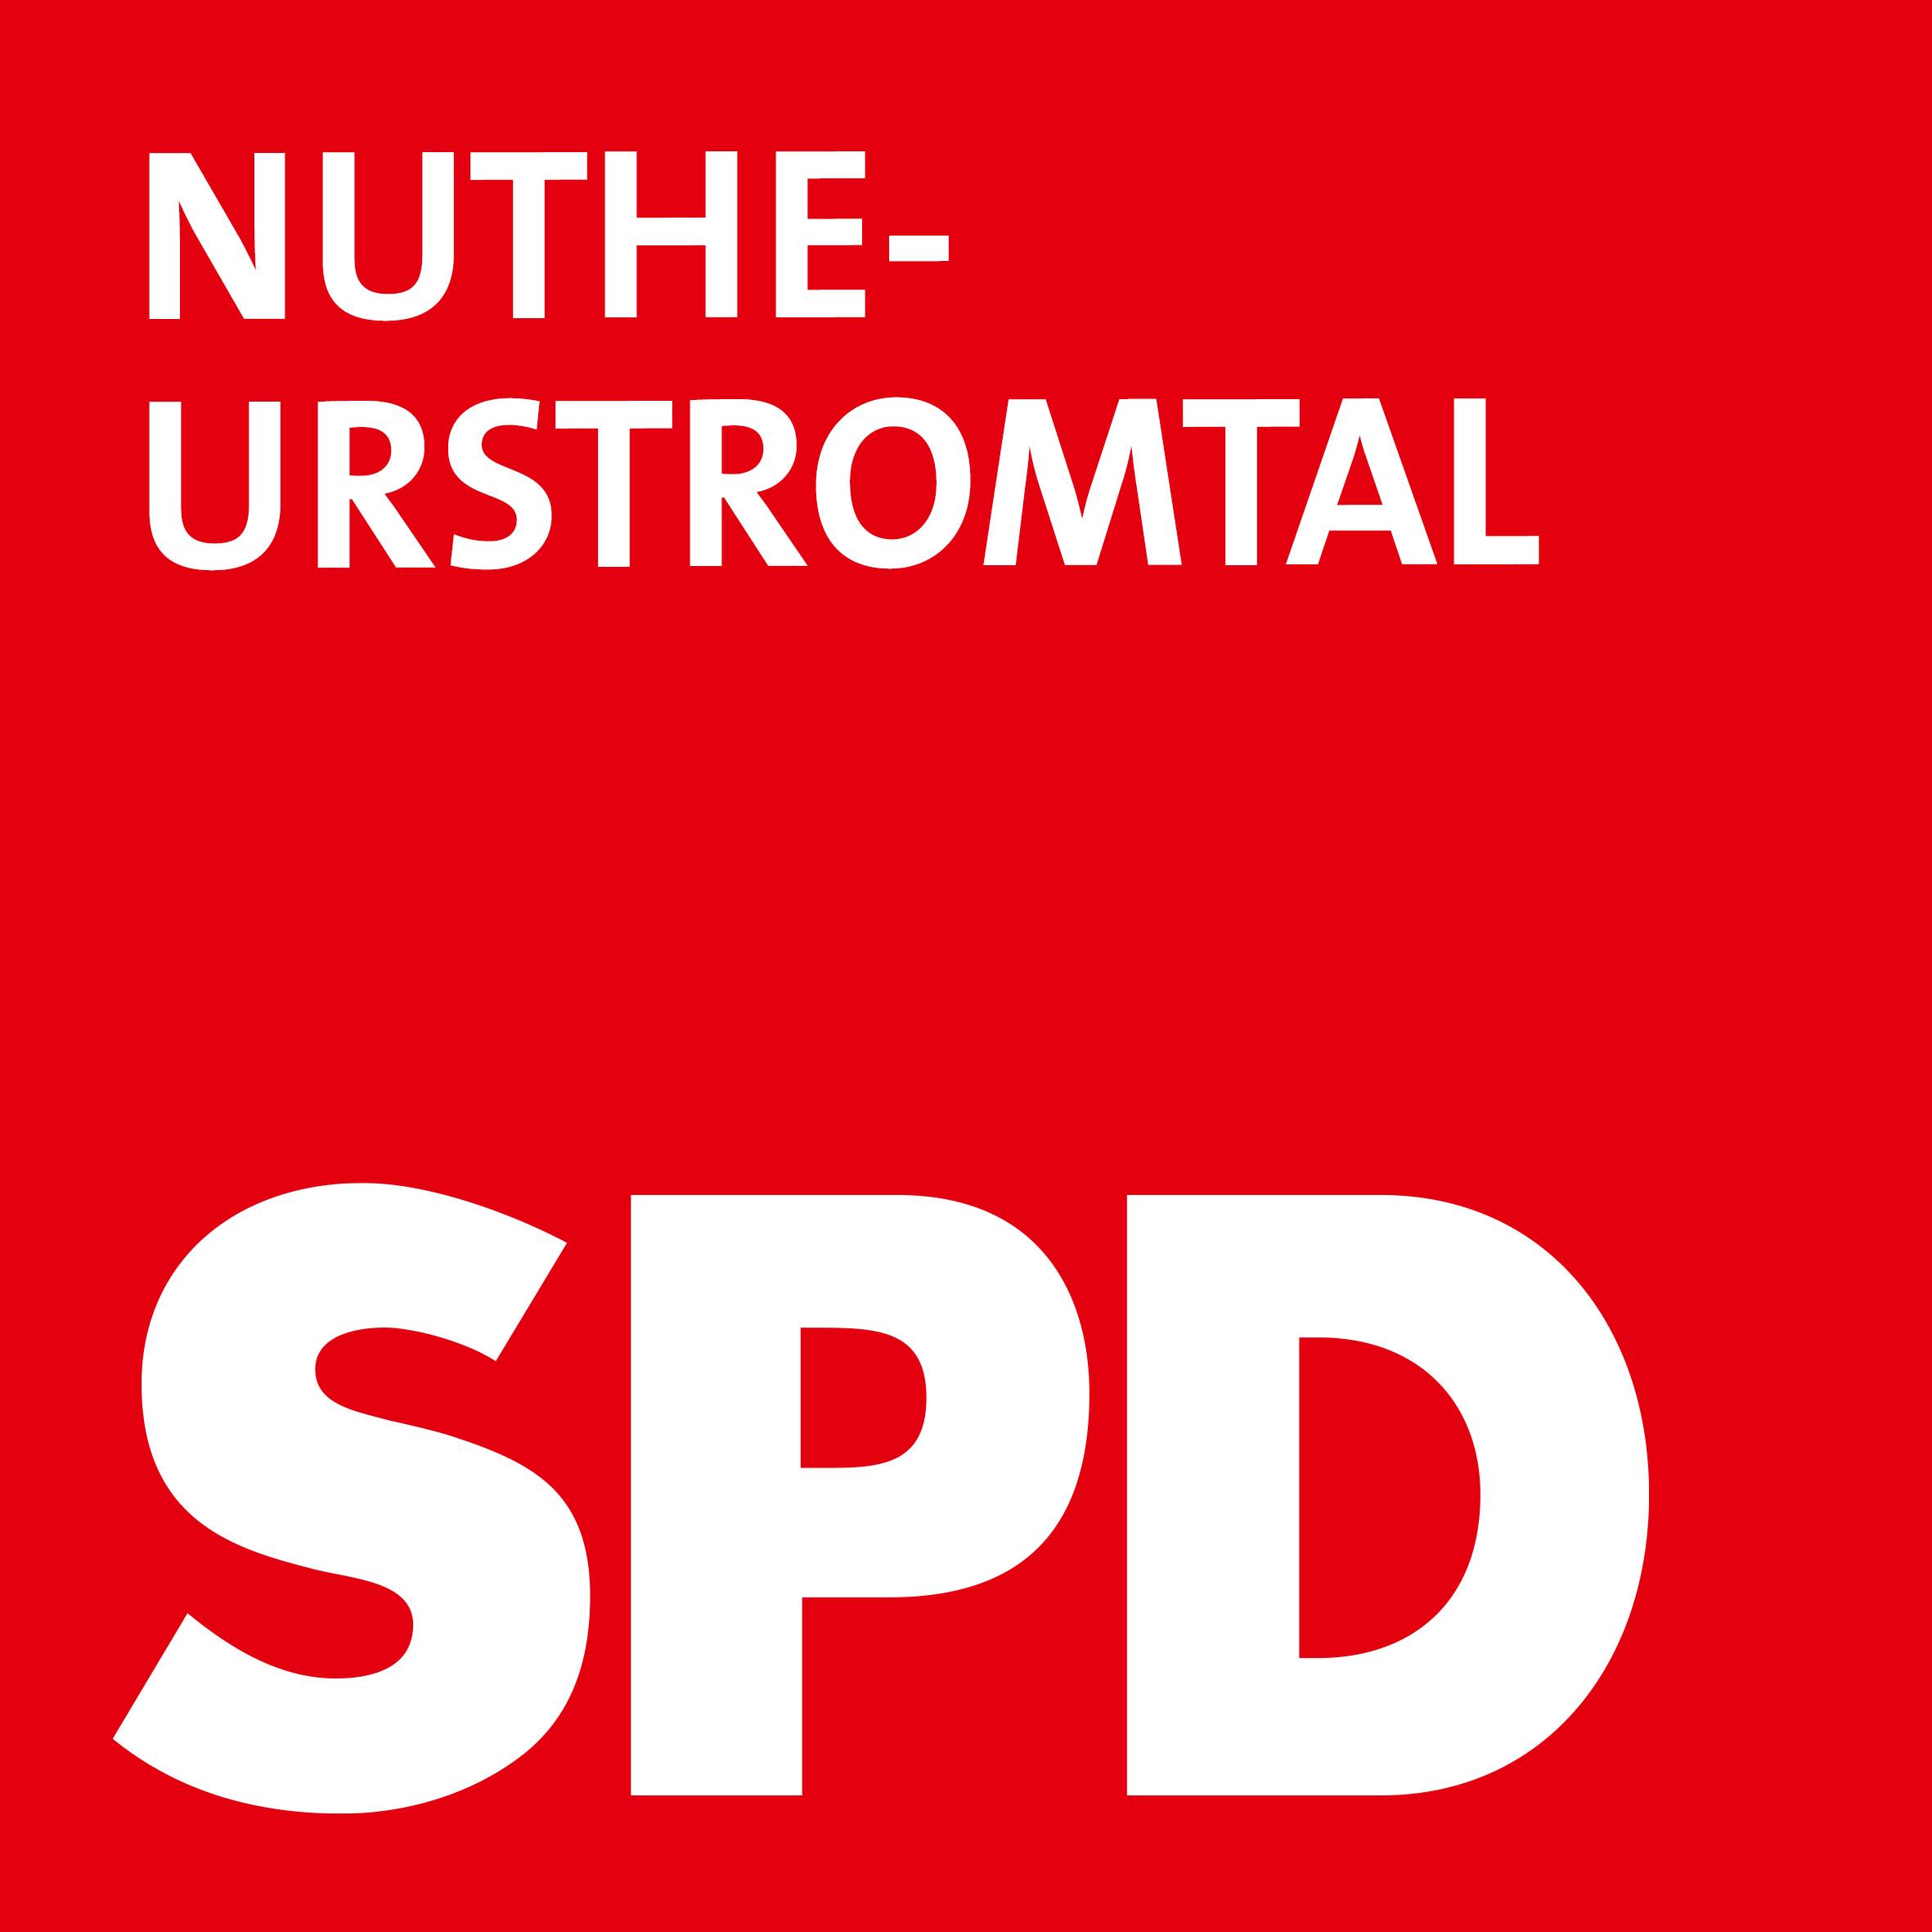 SPD Nuthe-Urstromtal